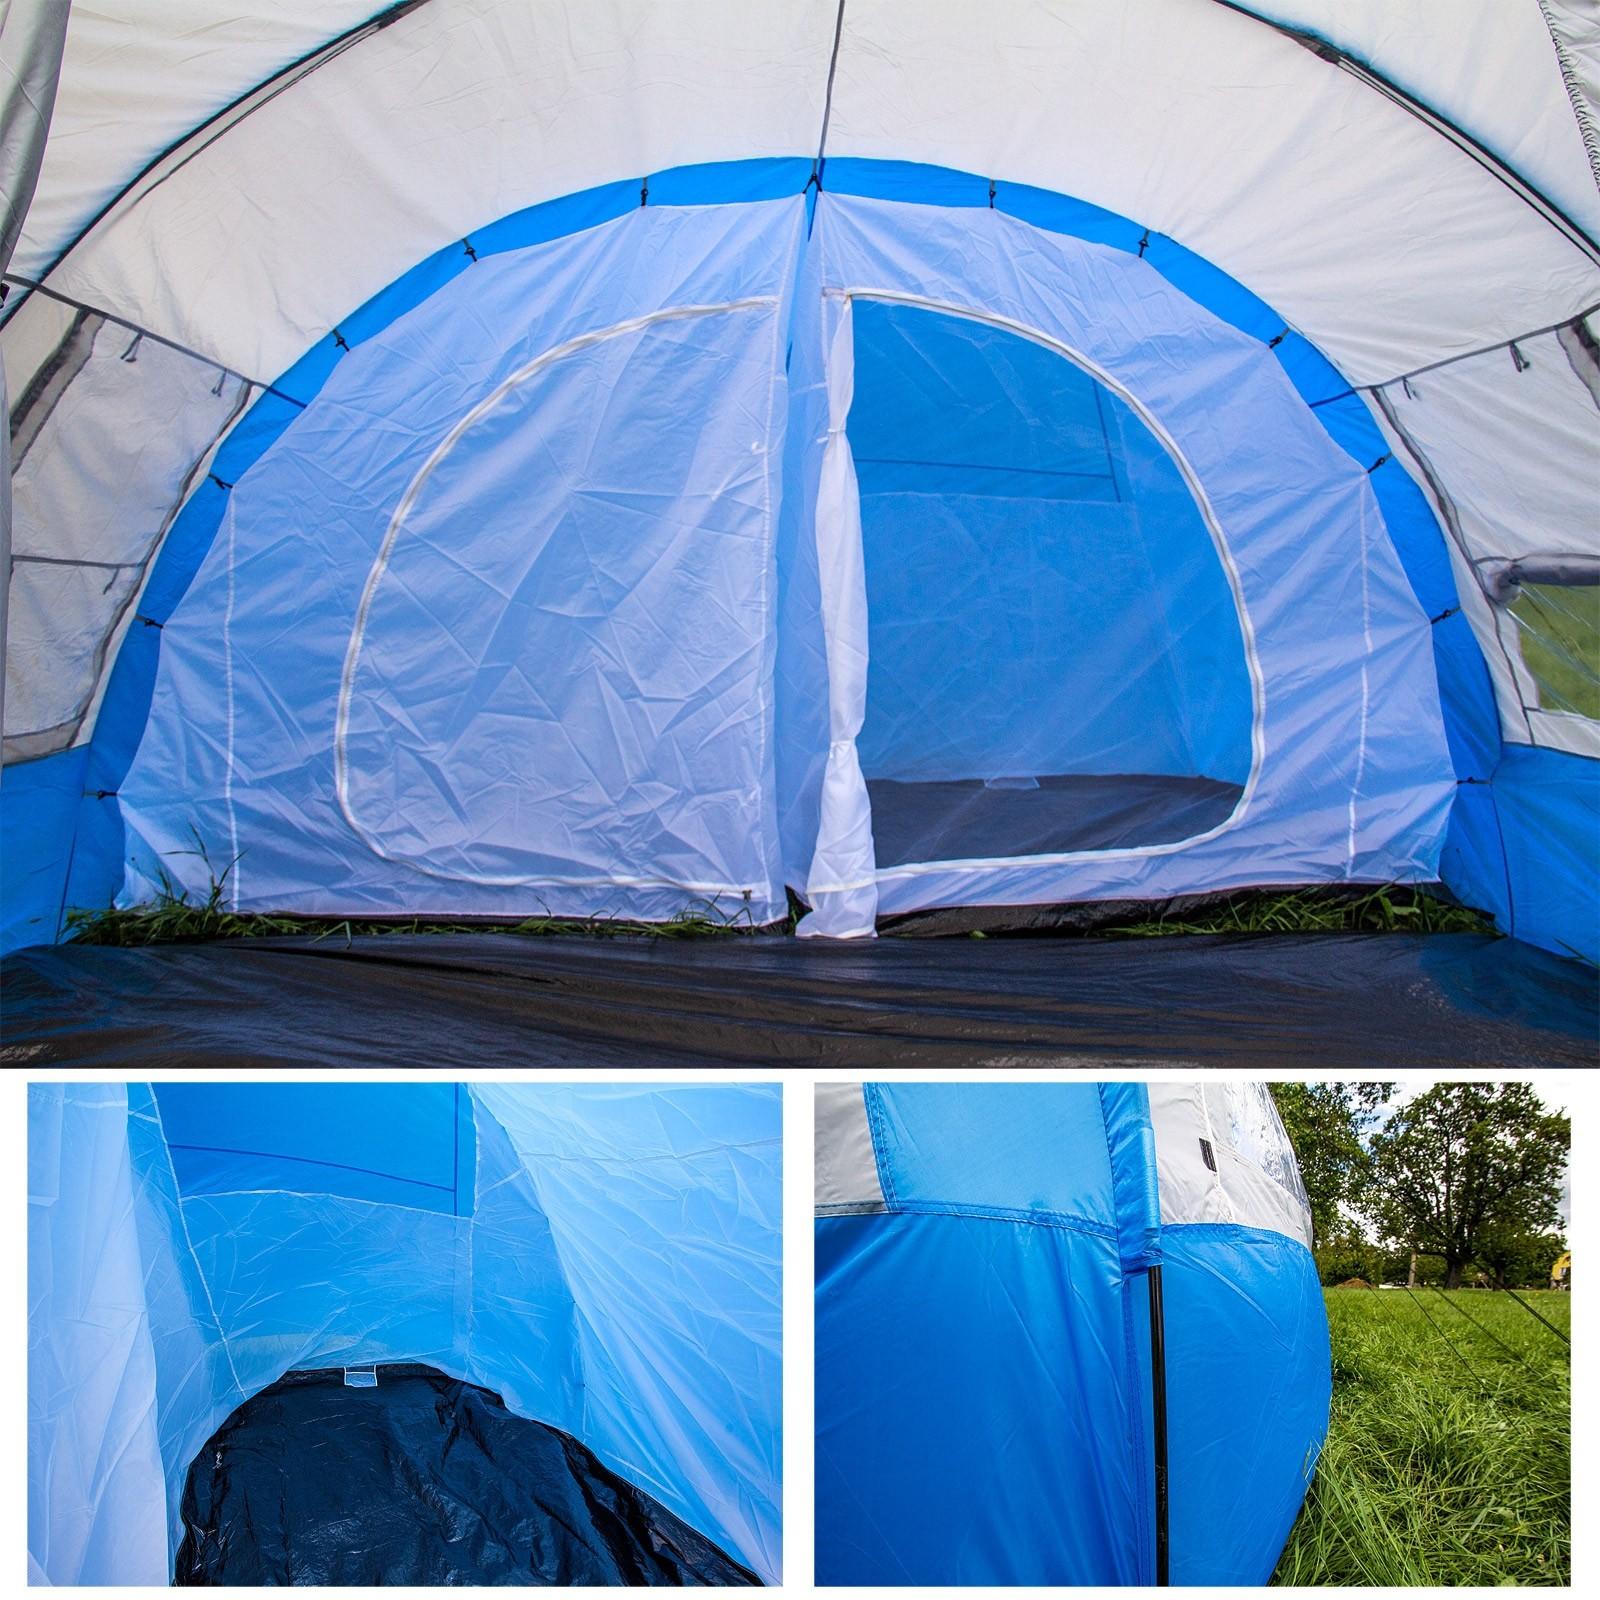 Familienzelt Zelt 6 Personen 480x365x215cm Blau Weiß Paradiso